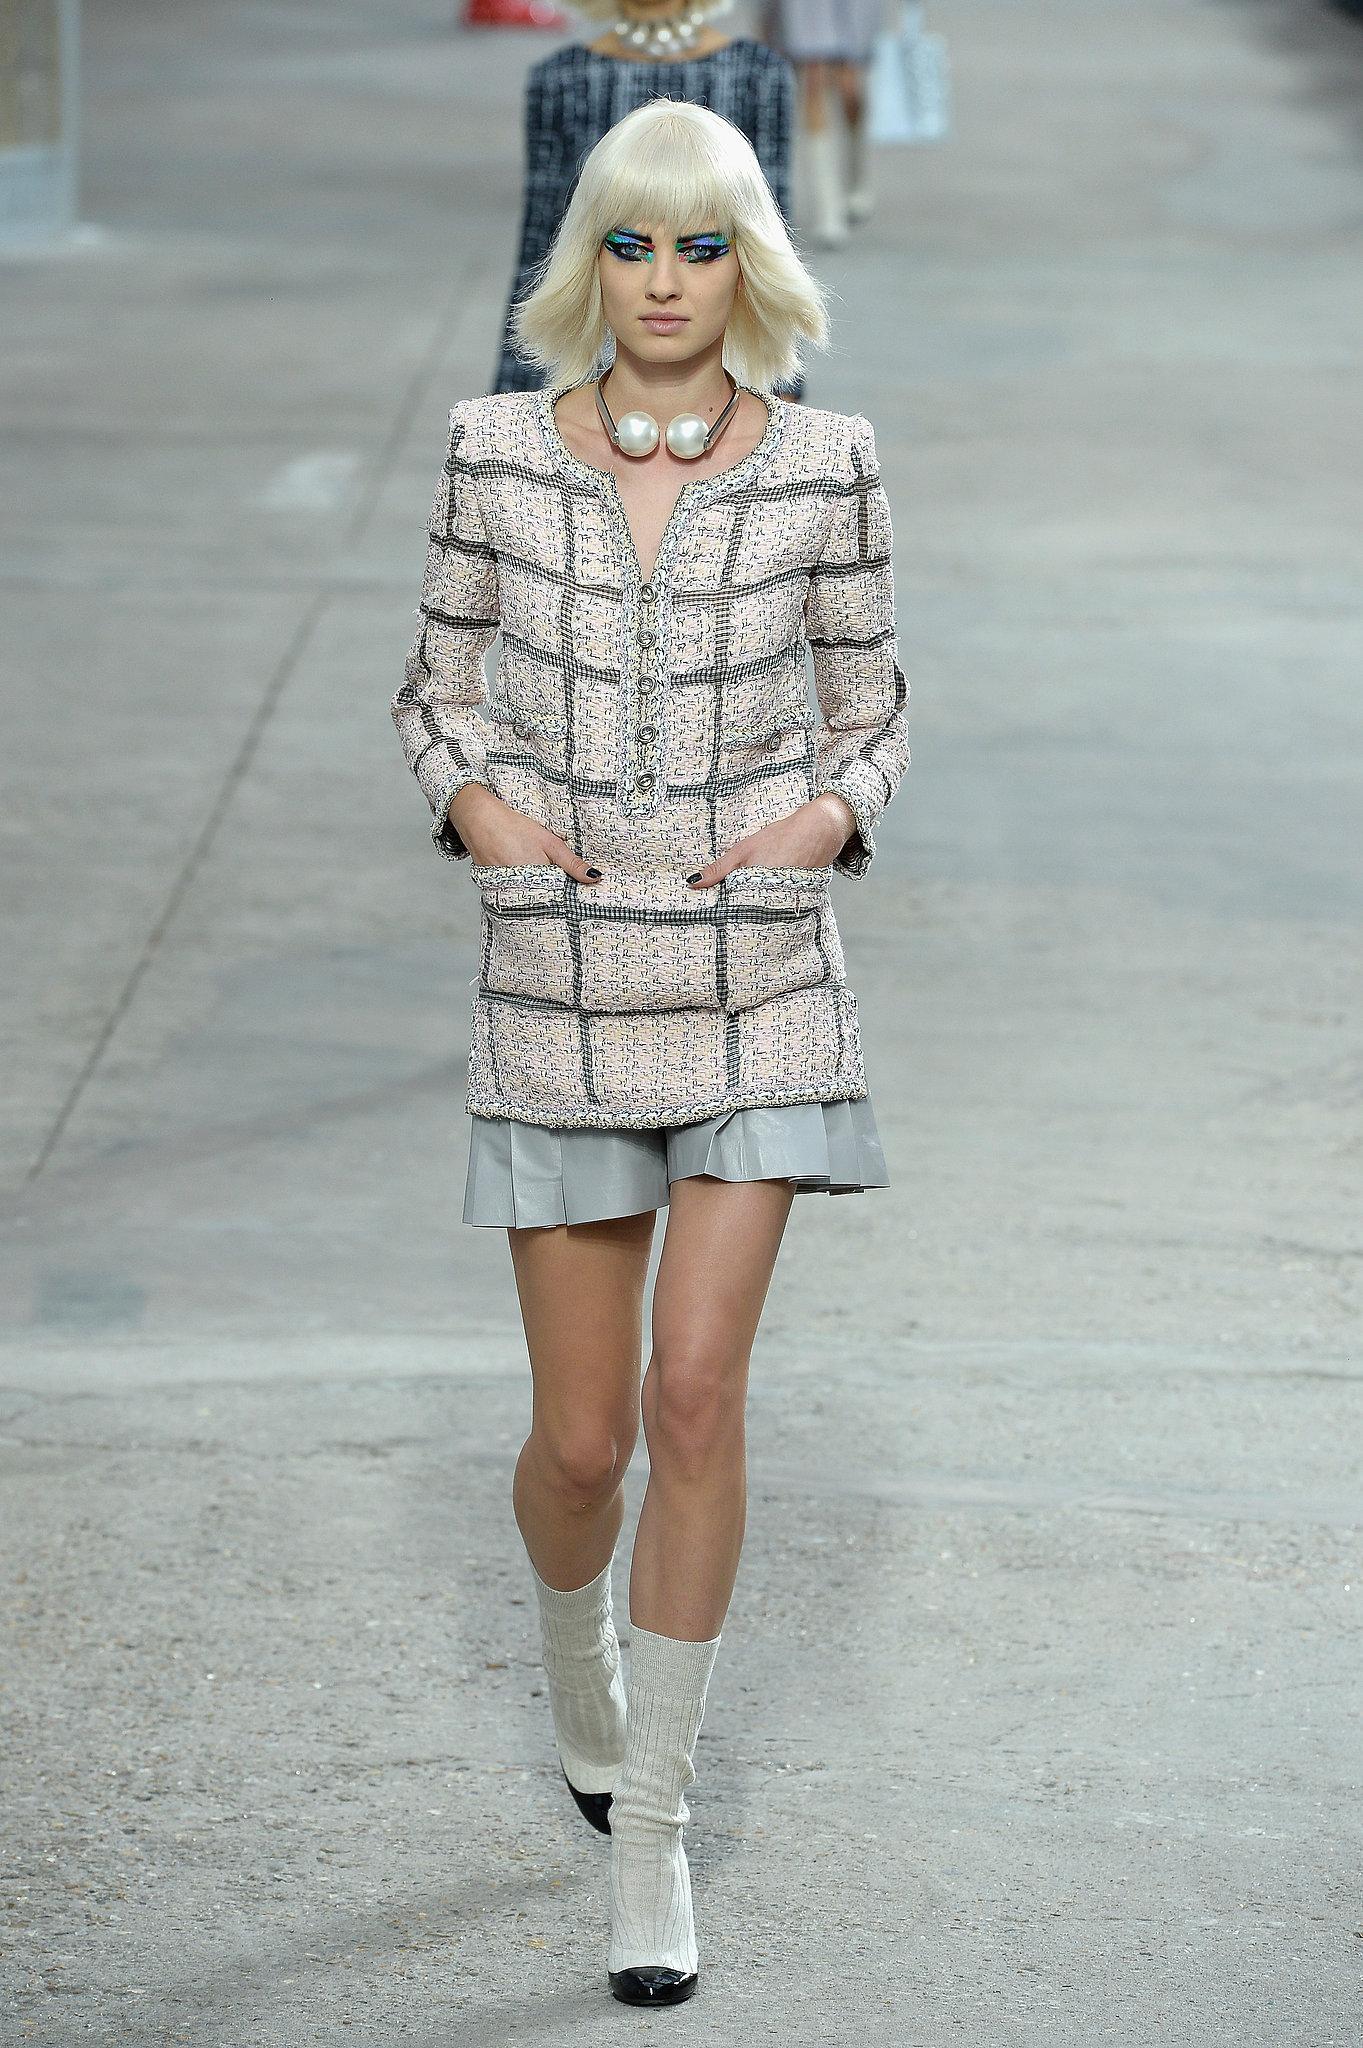 Miranda Kerr walked in the Chanel Spring 2014 fashion show.